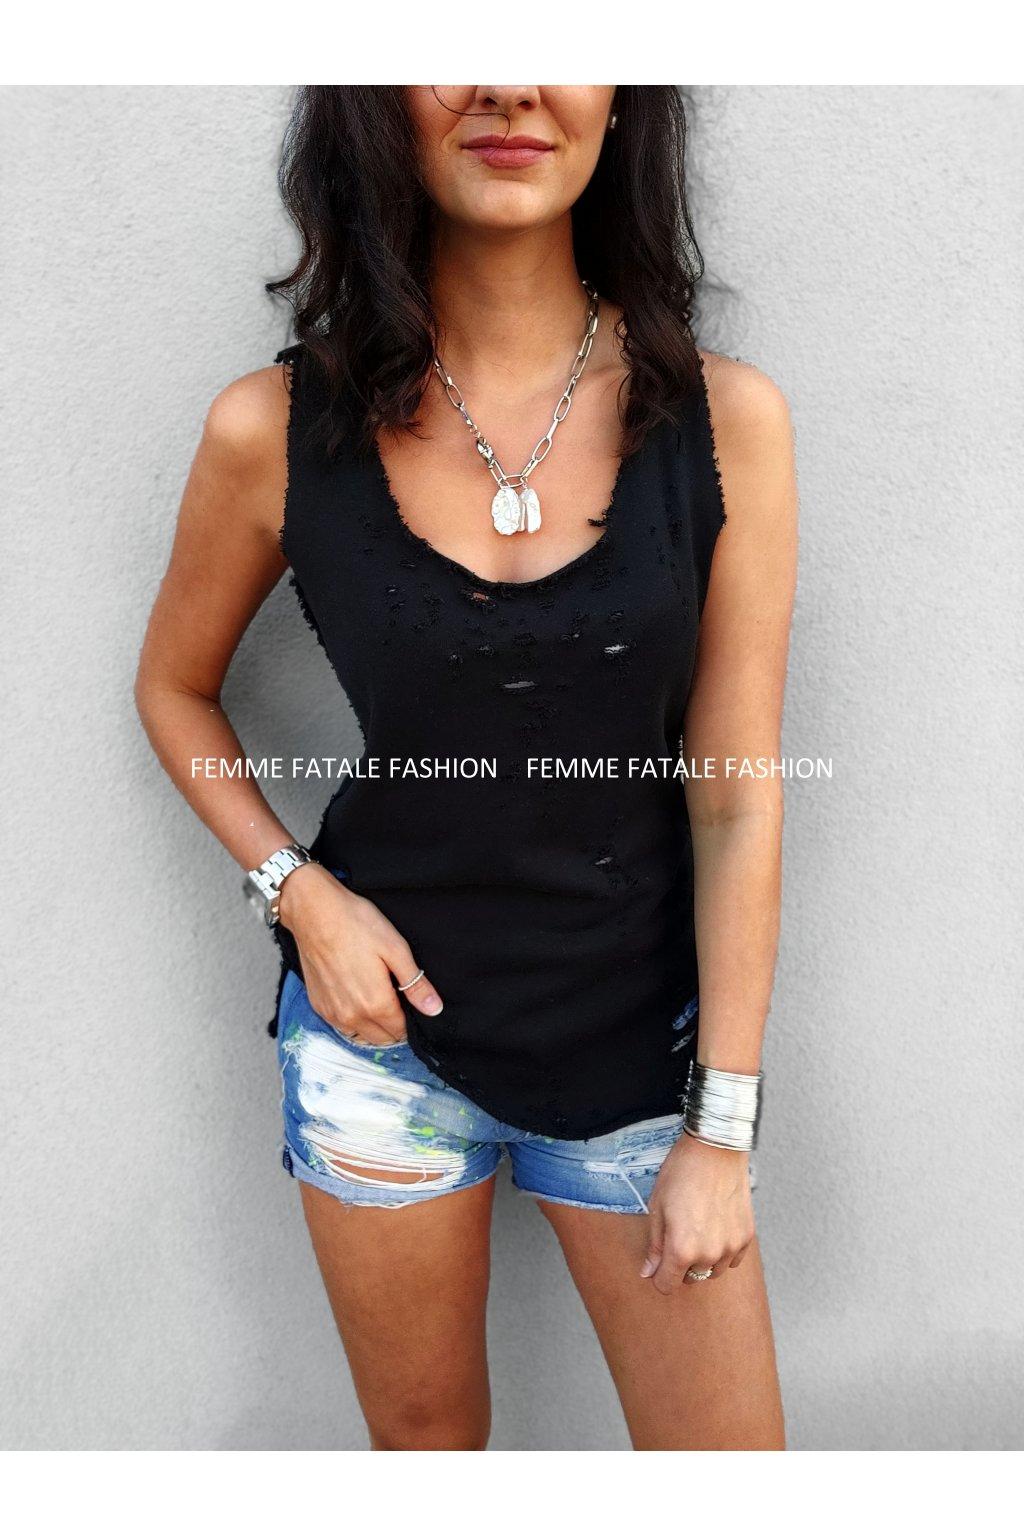 Ripped Tank Top VeryMary Clothes femmefatalefashion (1)